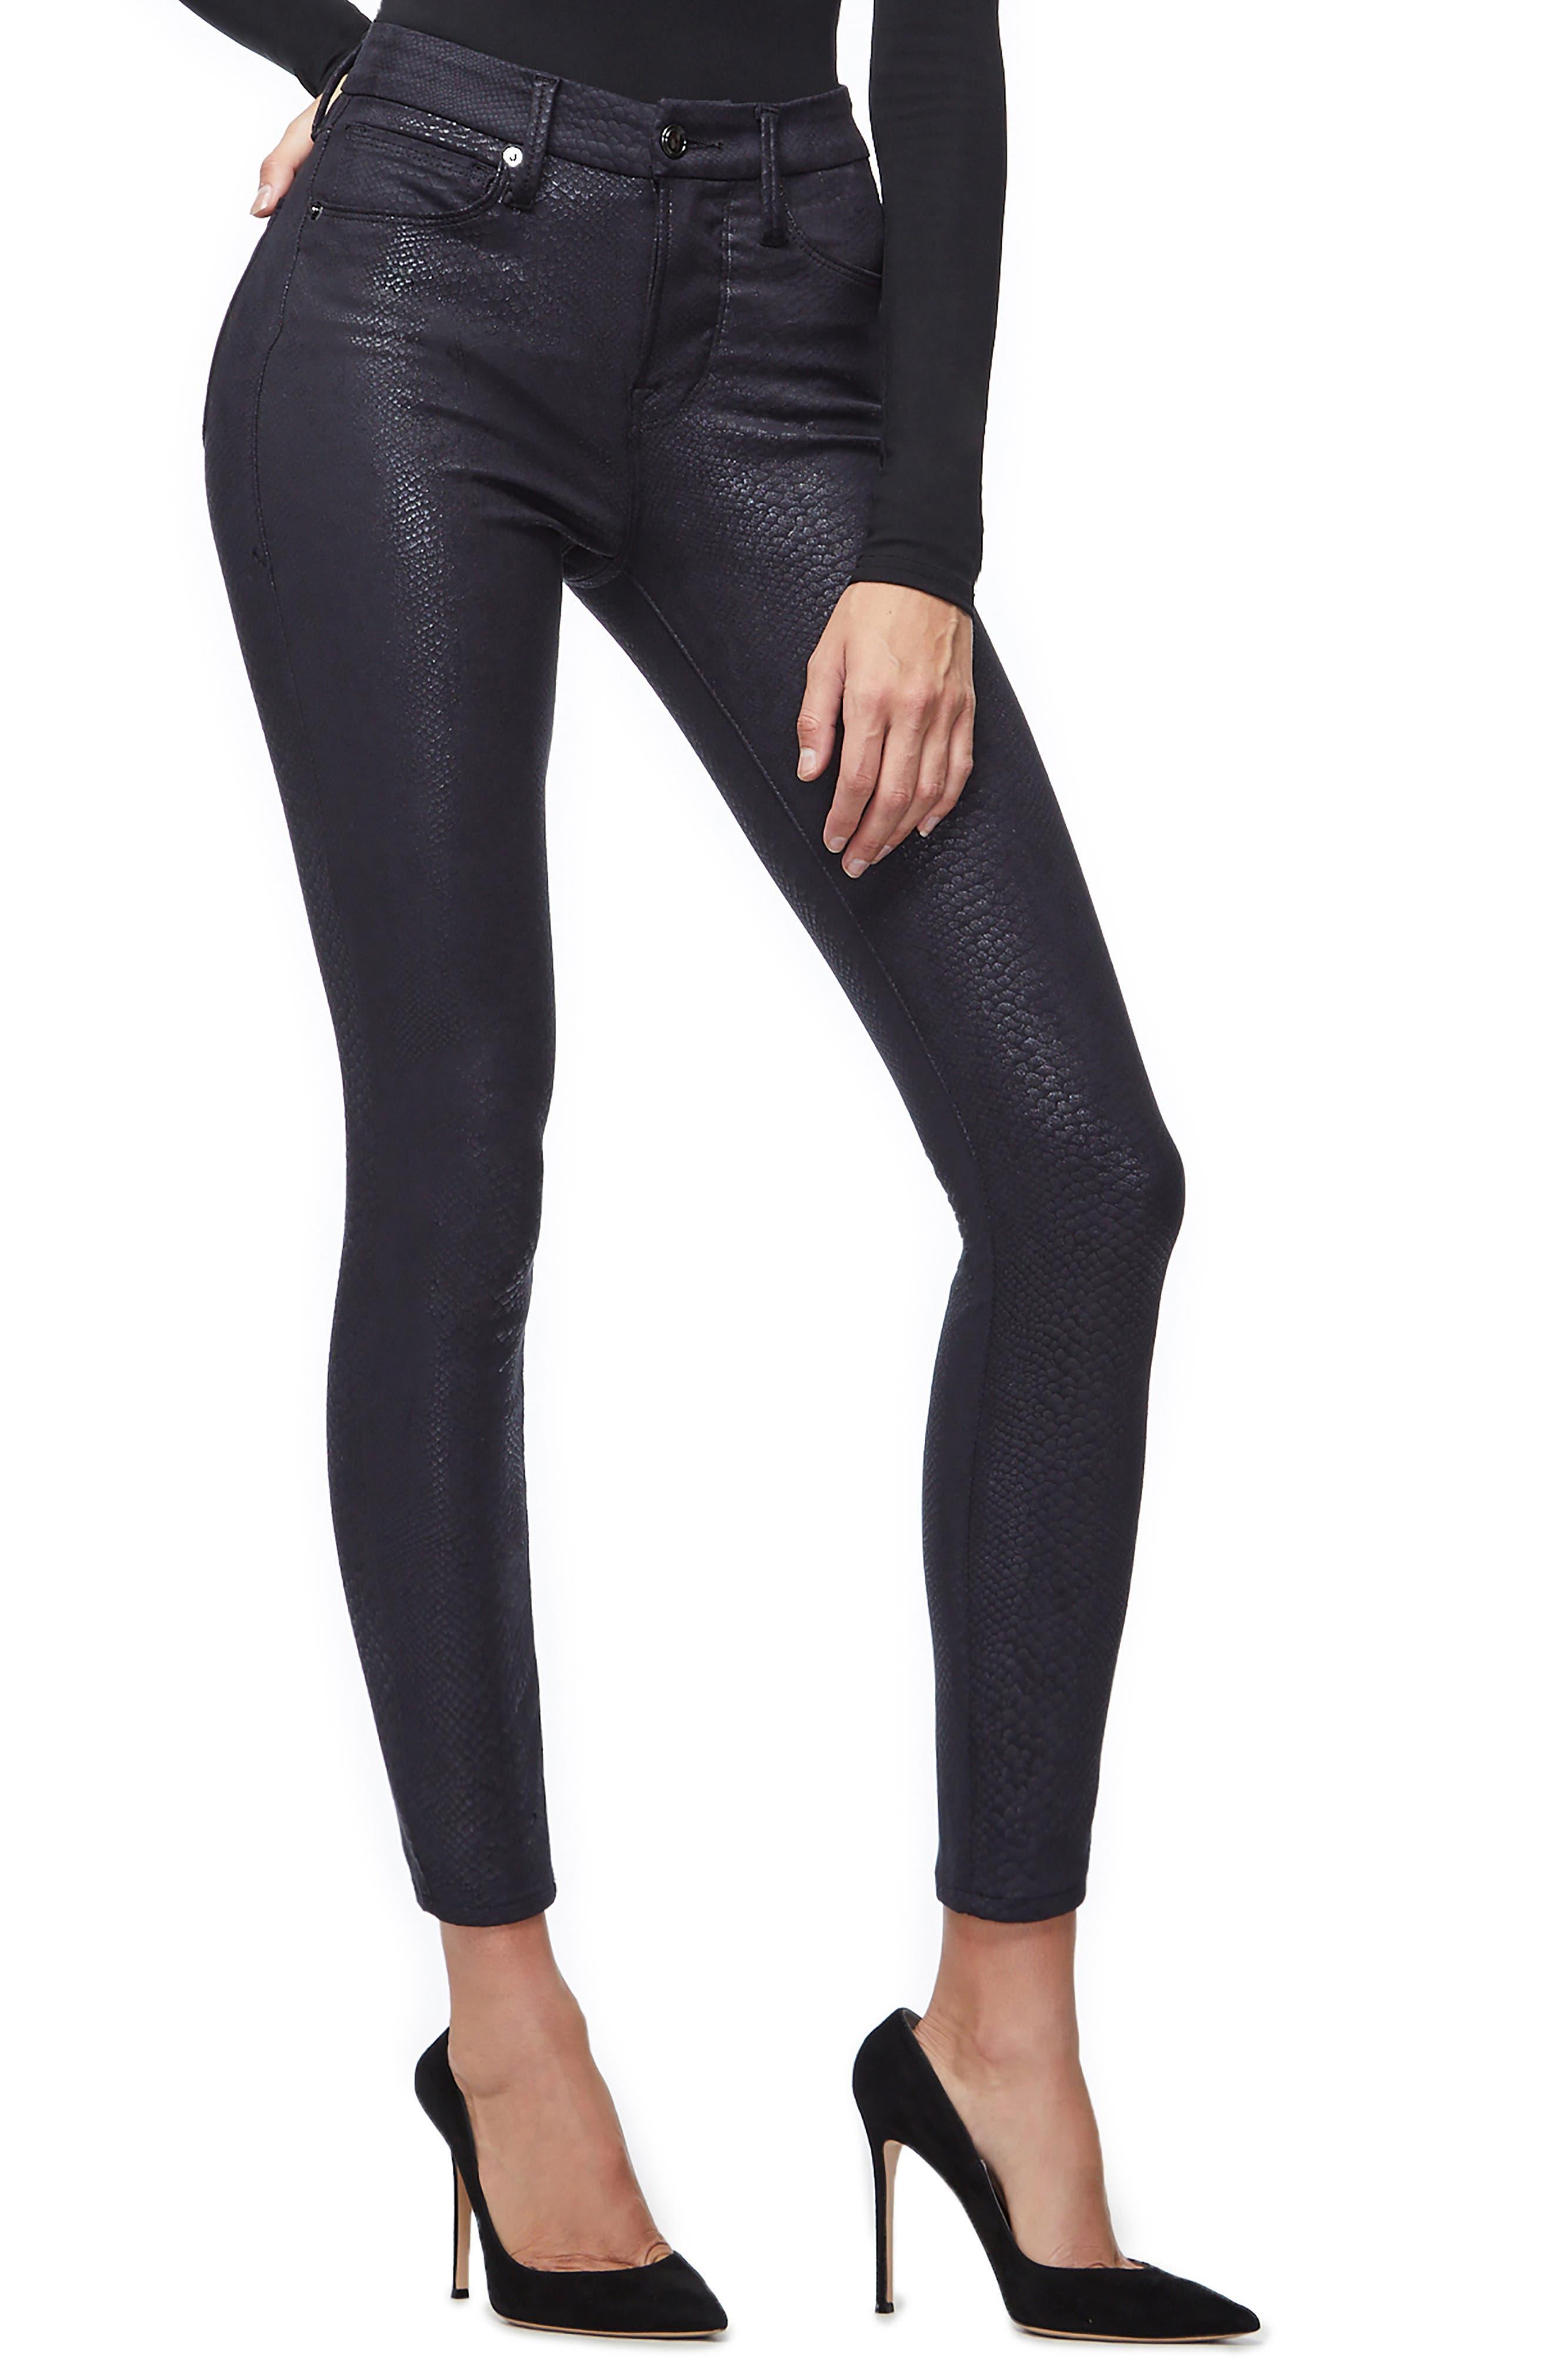 GOOD AMERICAN,                             Good Legs Metallic Snake Print Skinny Jeans,                             Alternate thumbnail 5, color,                             BLACK041